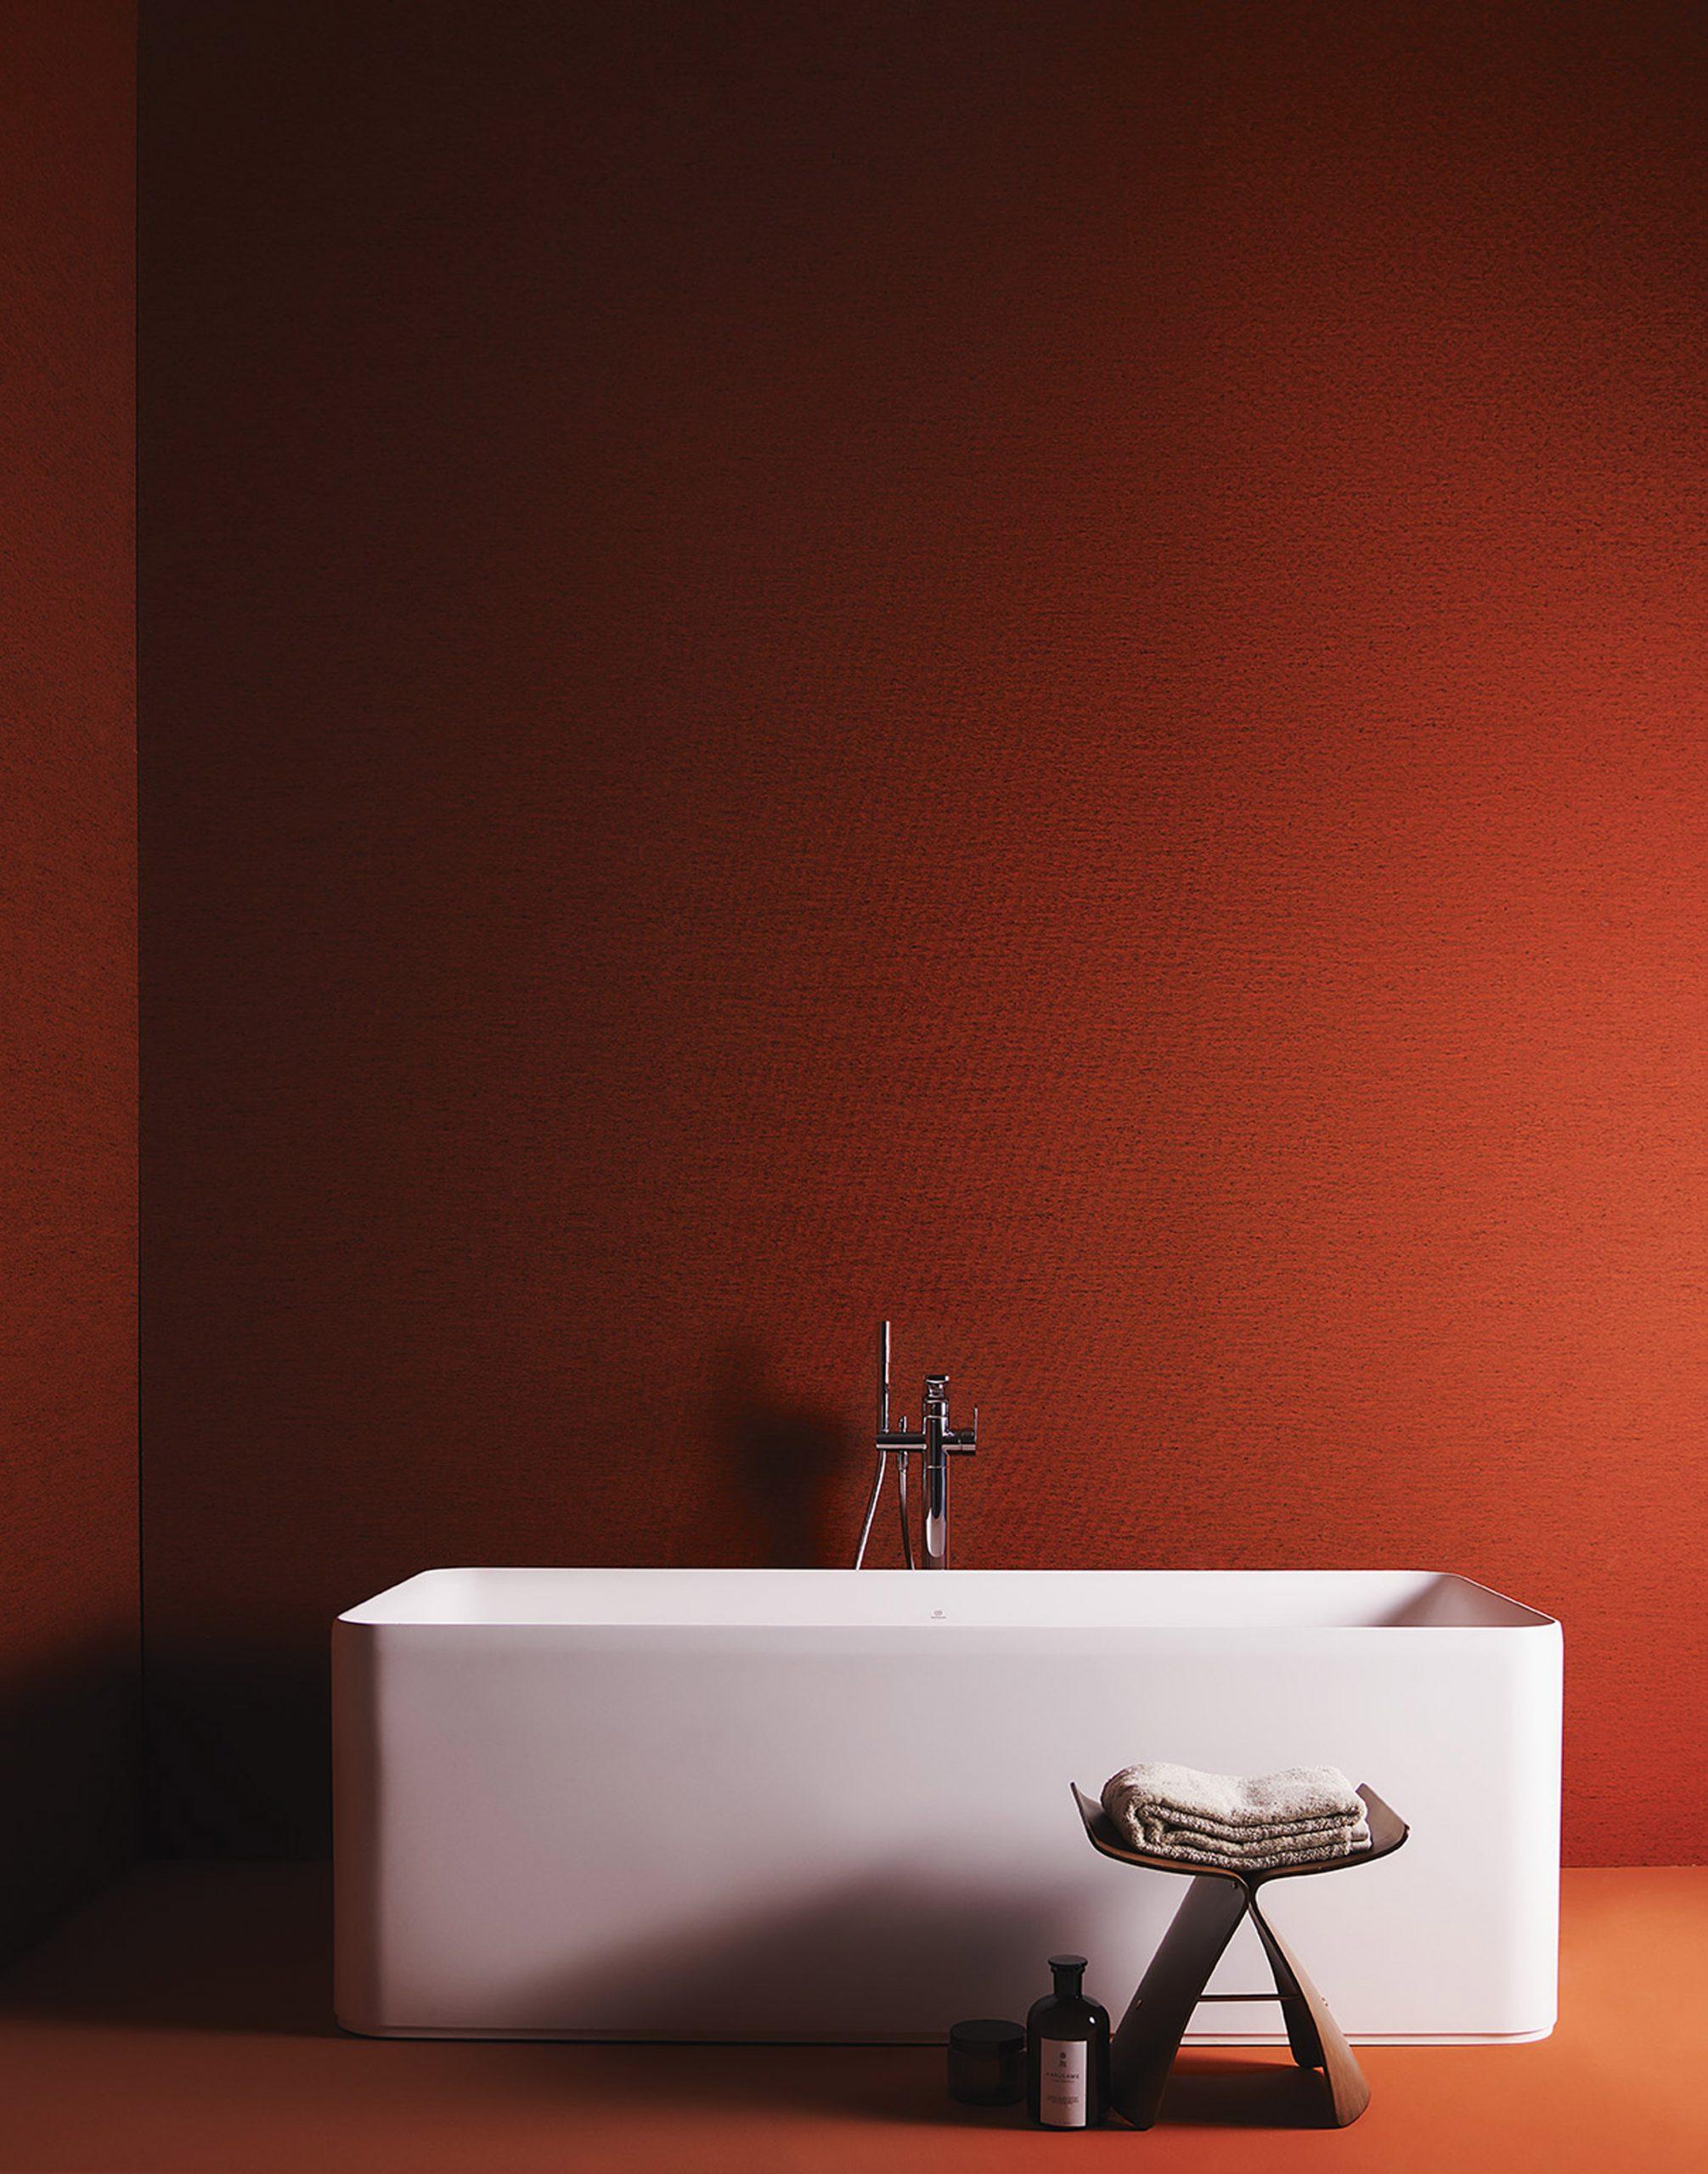 A warm orange bathroom with a freestanding white bath